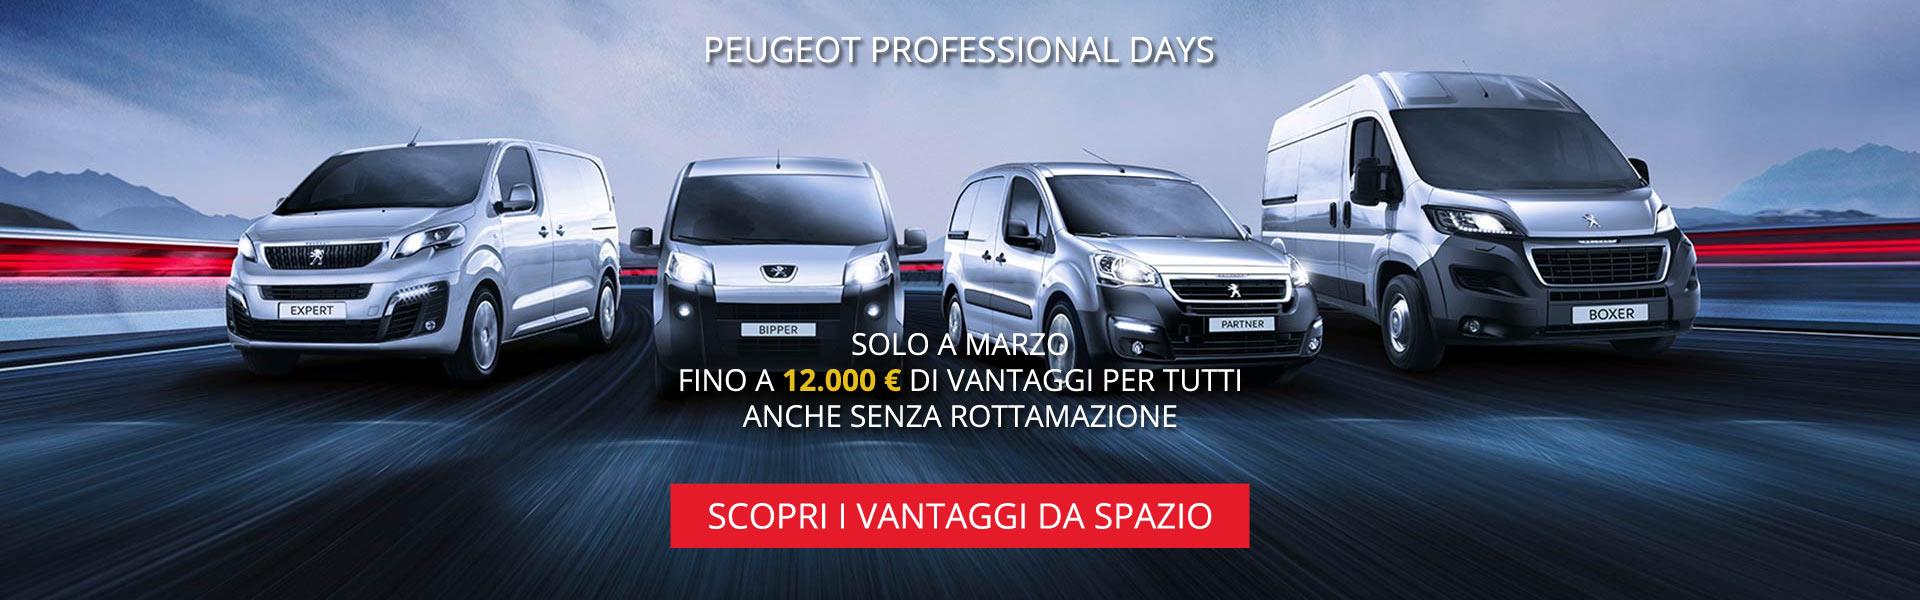 Peugeot Professional Days